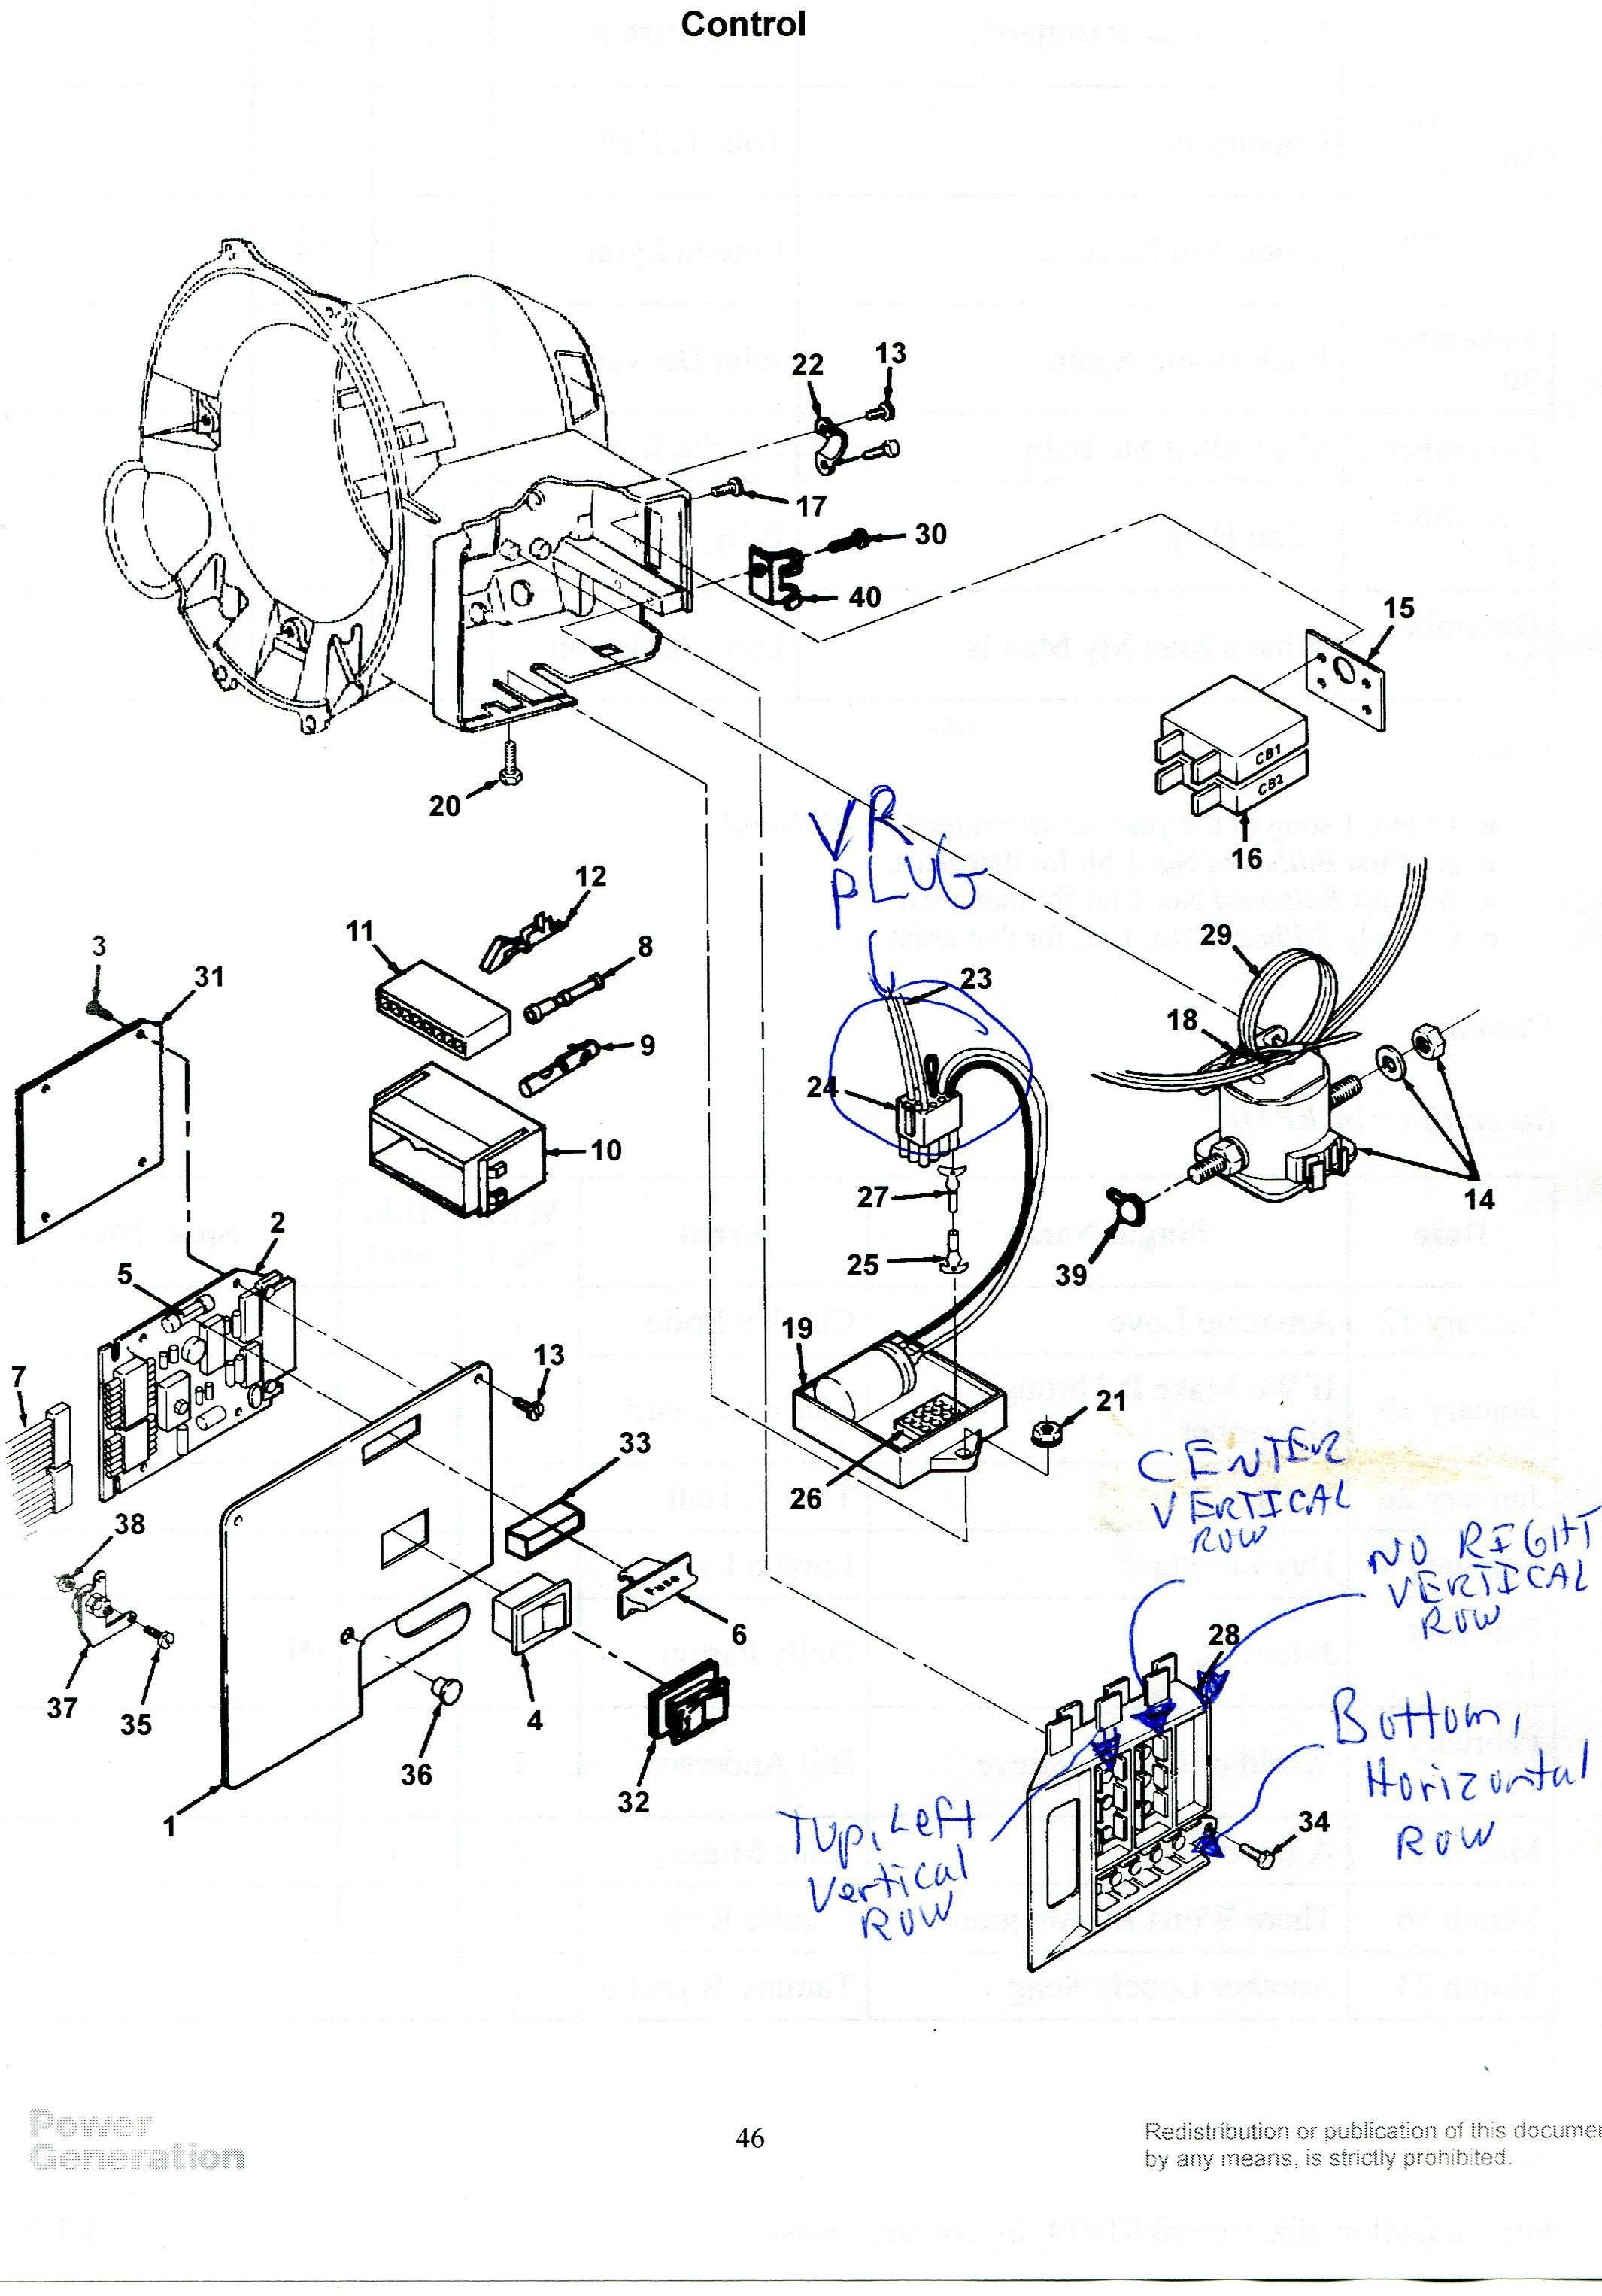 5915A5 Onan Emerald 1 Genset Wiring Diagram | Wiring Diagram Image | Wiring  LibraryWiring Library